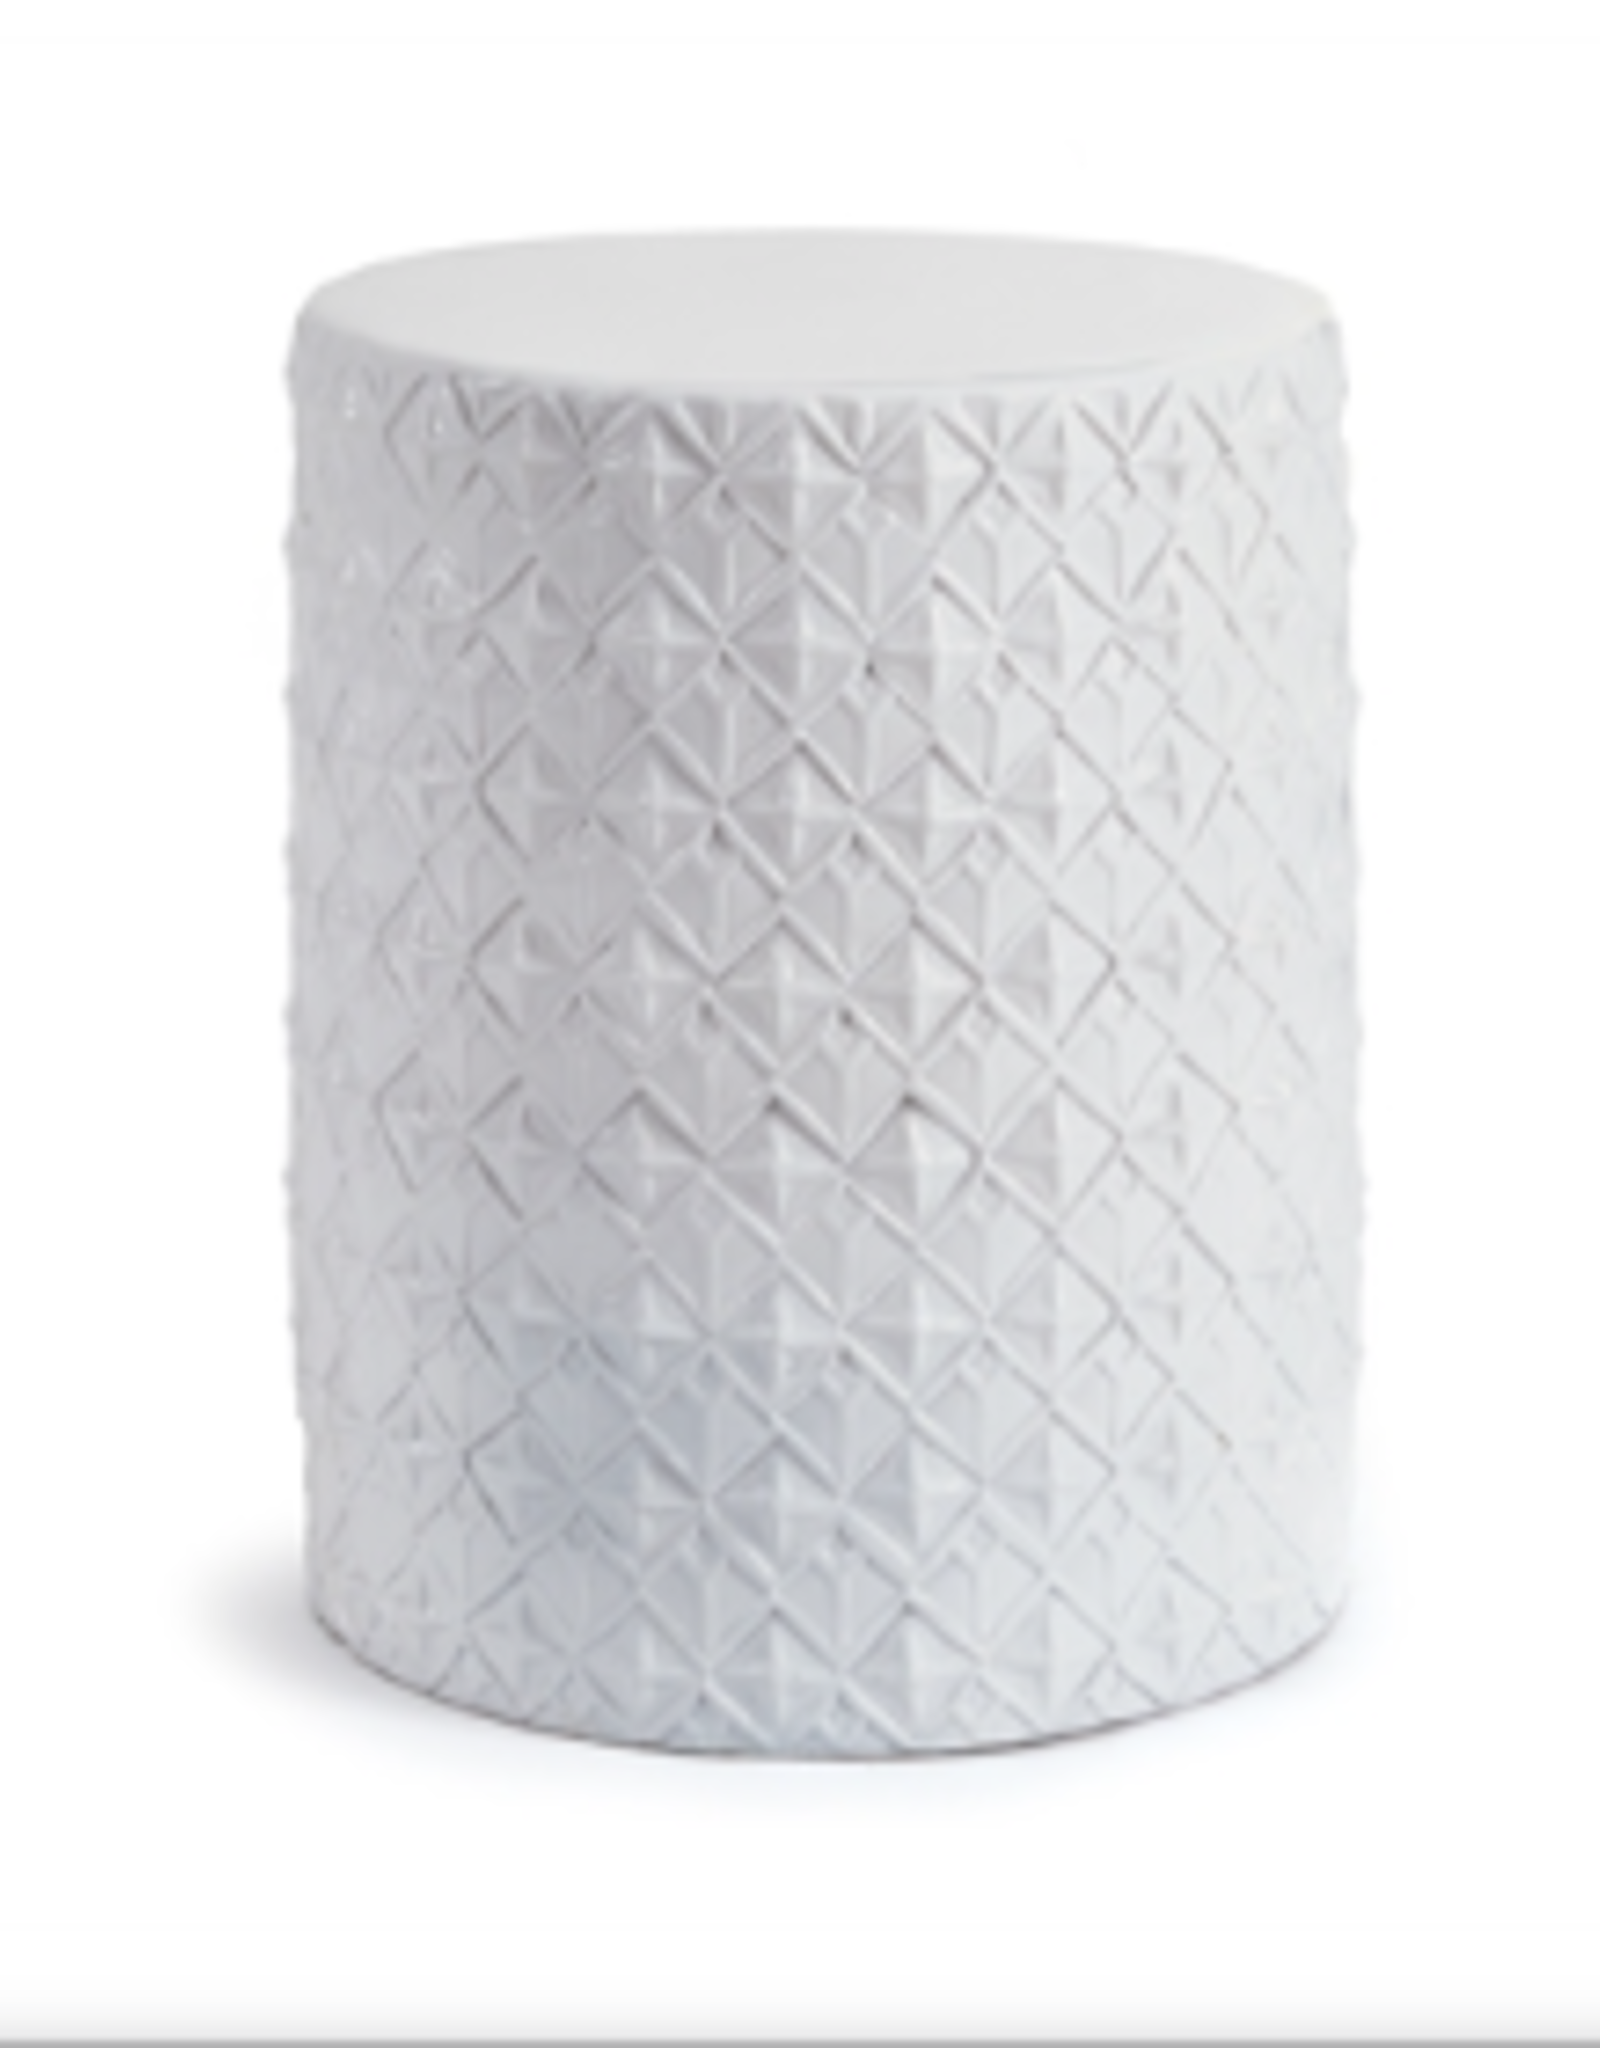 White Ceramic Stool with Geometric Pattern